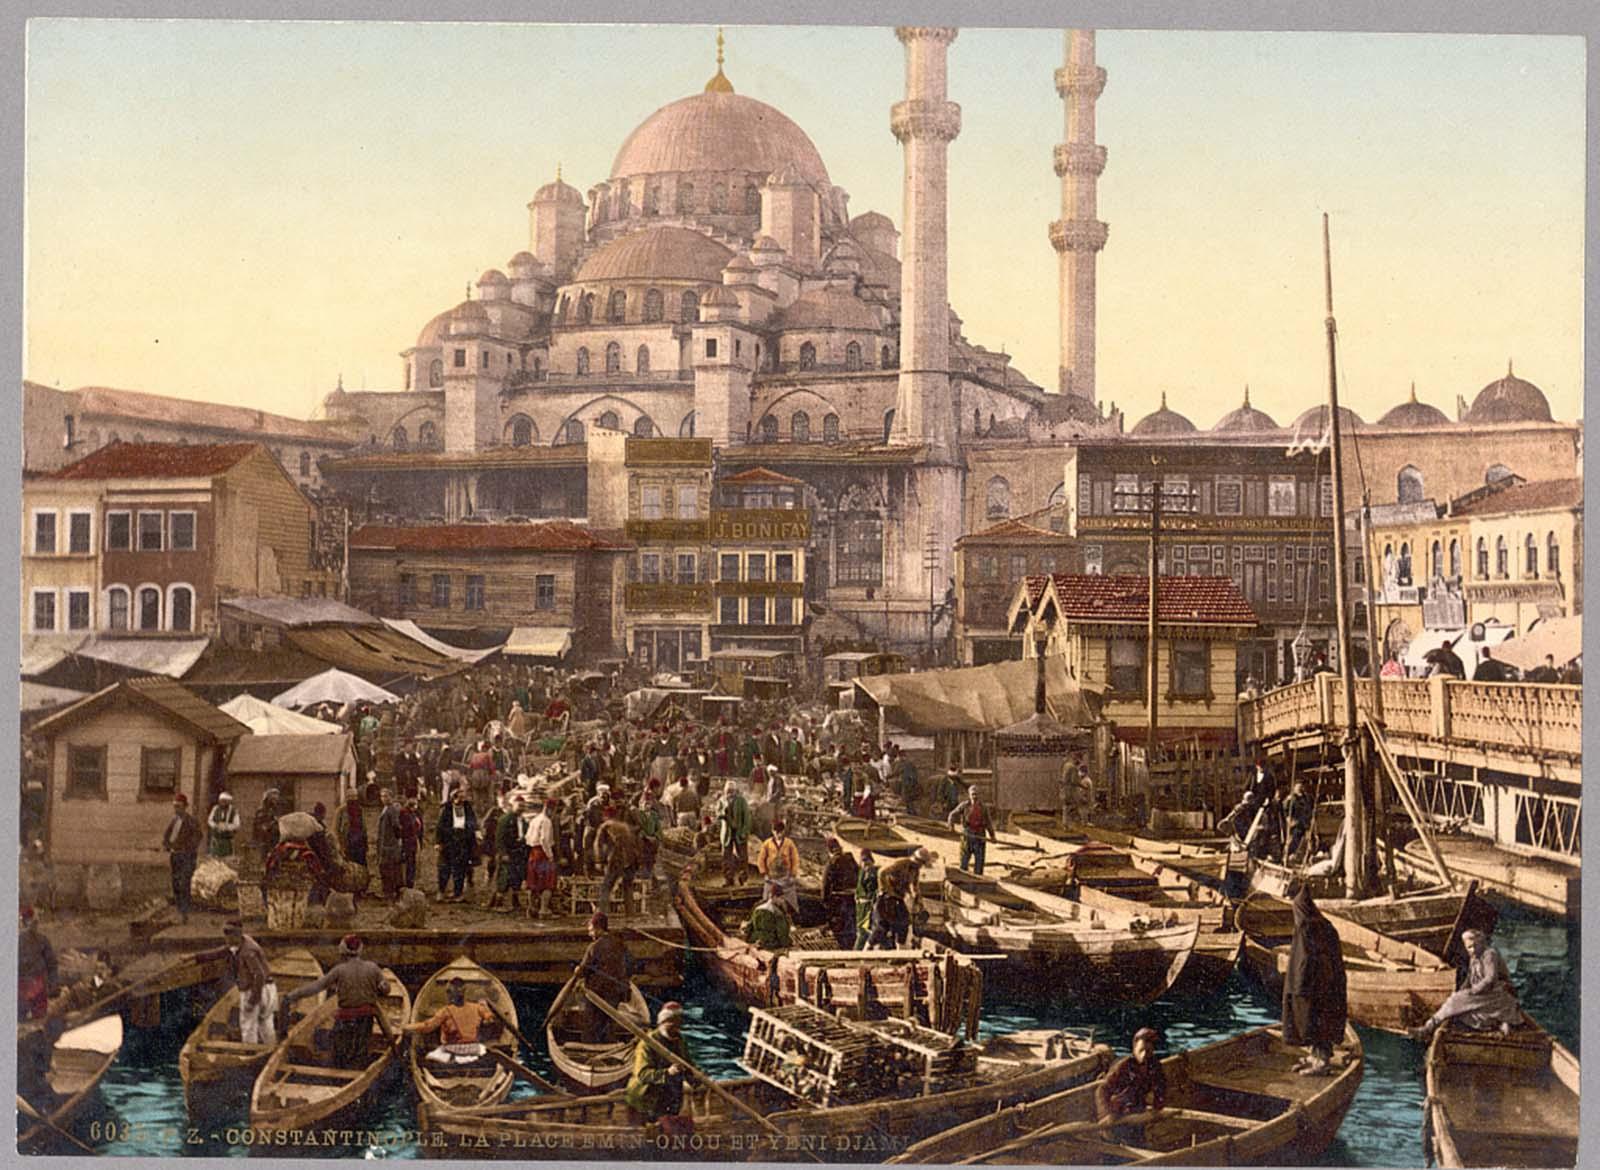 Yeni Cami mosque and Eminönü bazaar.